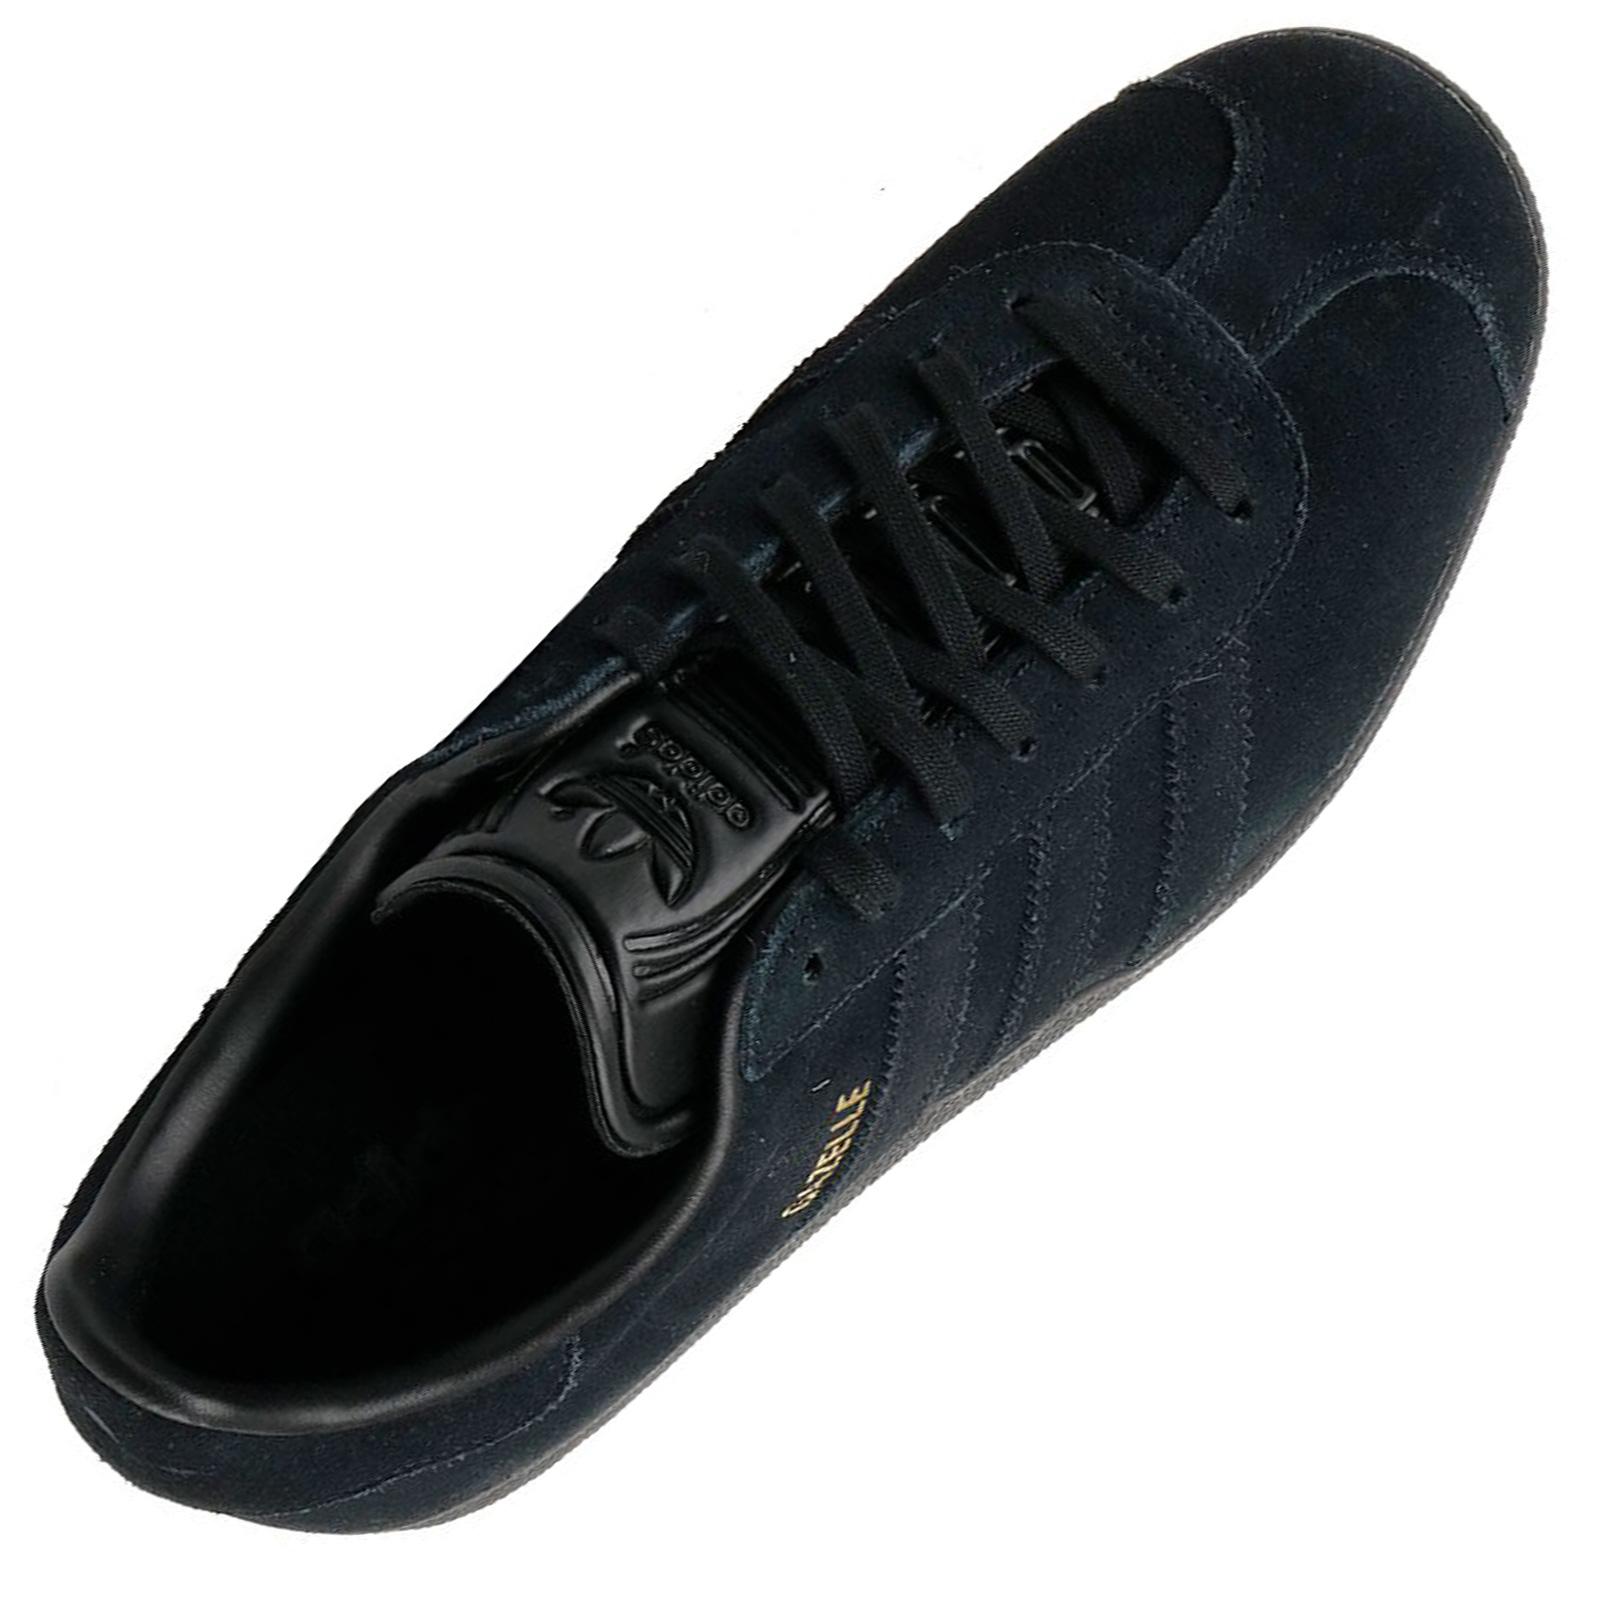 Details about Adidas Gazelle Retro Sneaker Trainers Leather Sneaker All Black Black show original title